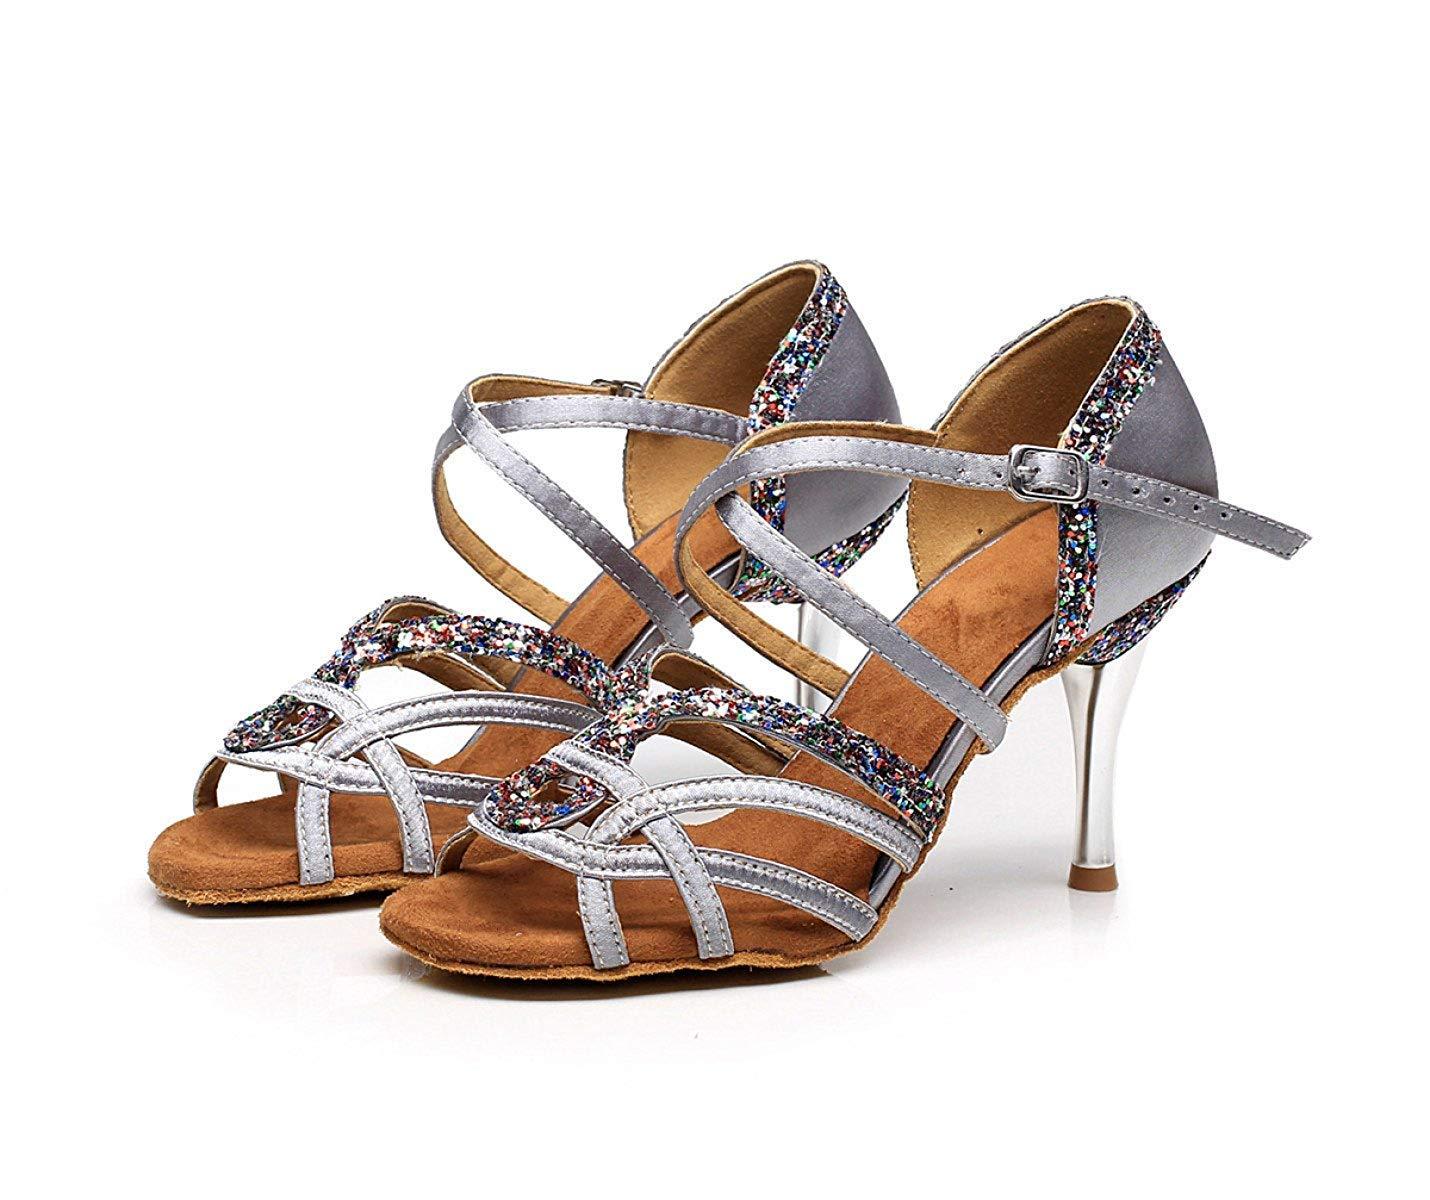 Tanzschuhe Frauen für für für Latin Ballsaal Salsa Floral Satin Tango Chacha Samba Modern Jazz Schuhe Sandalen High Heels Silber-Absatz7.5cm-UK4.5   EU36   Our37 2598c8